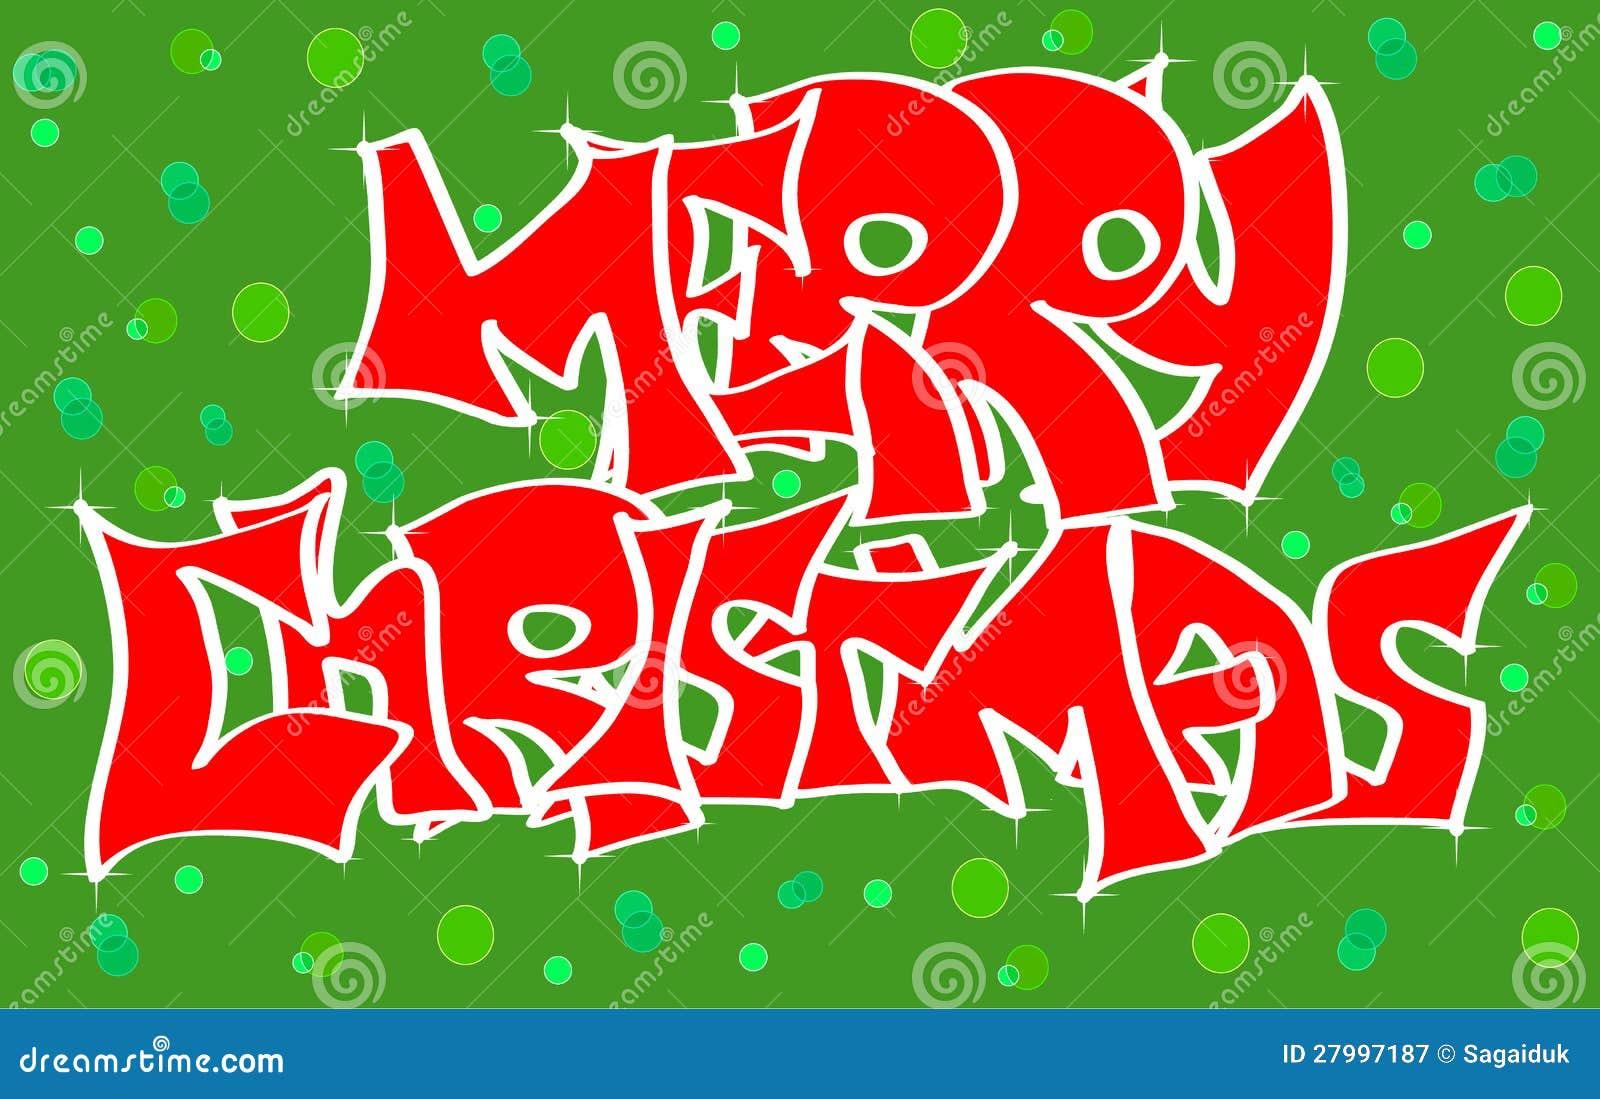 Christmas Graffiti Letters.Merry Christmas Graffiti Stock Vector Illustration Of Drawn